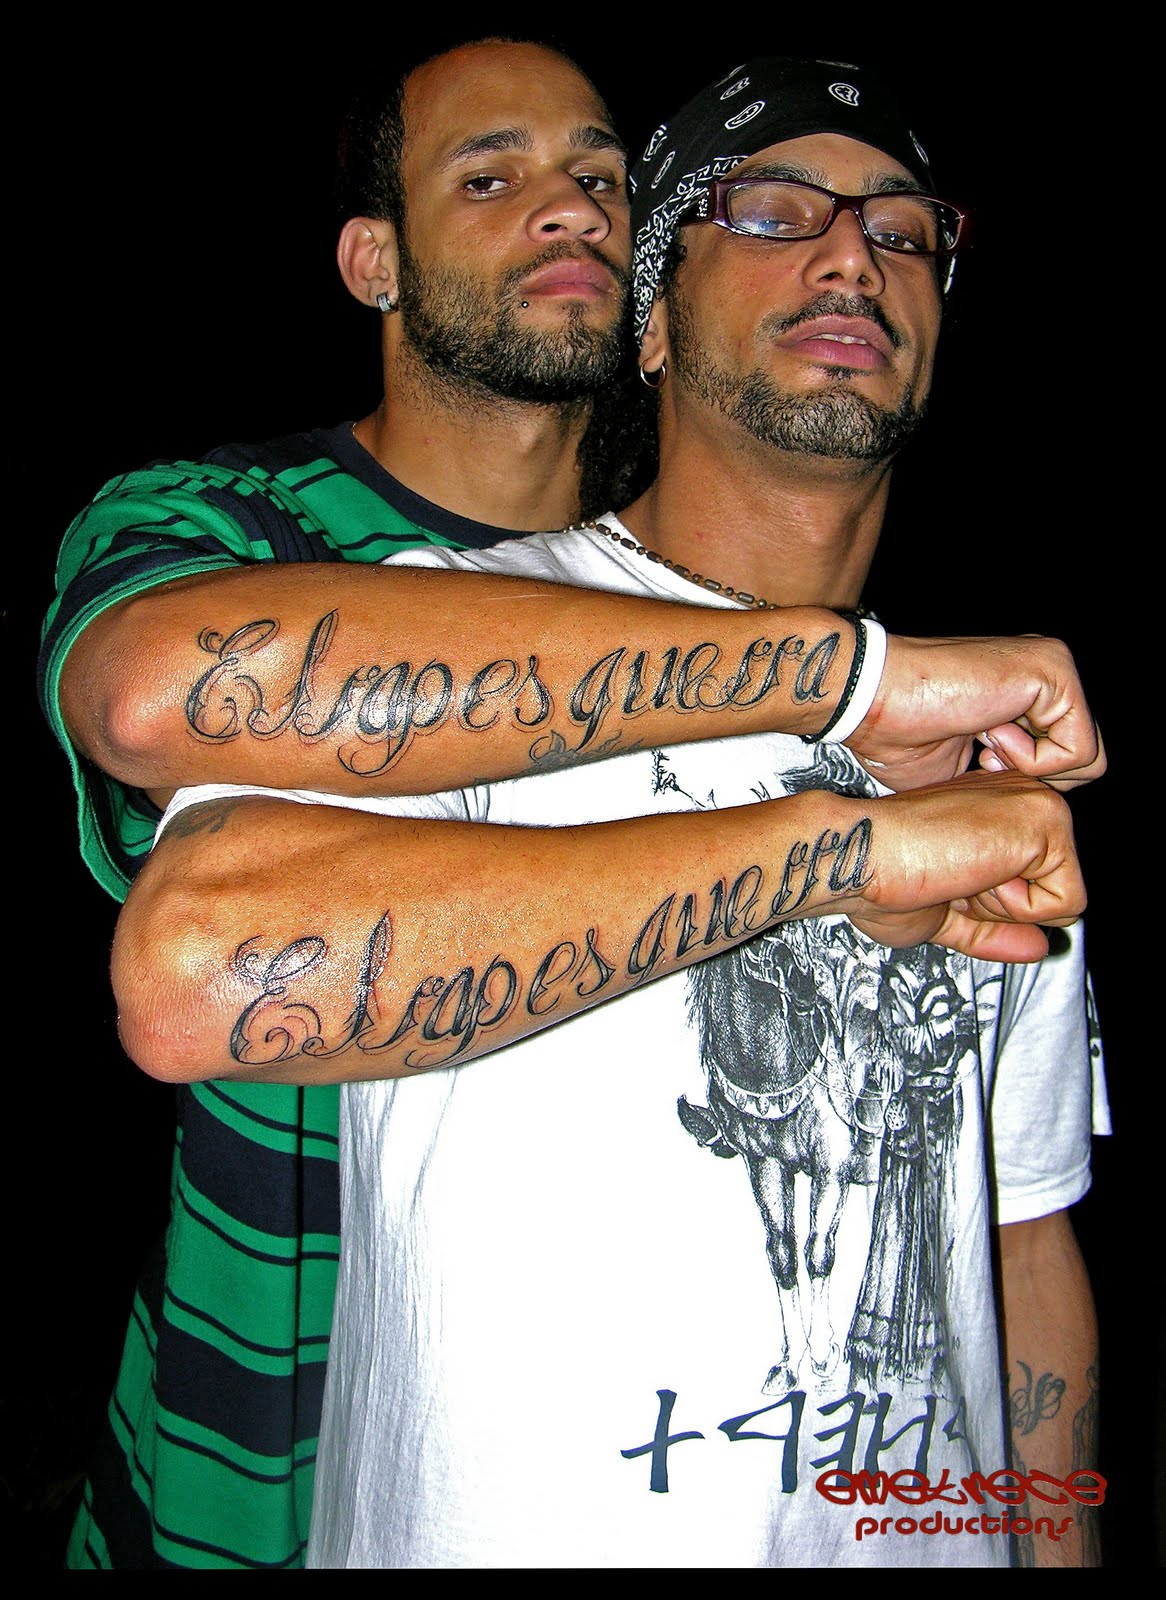 grupos de musica rap: